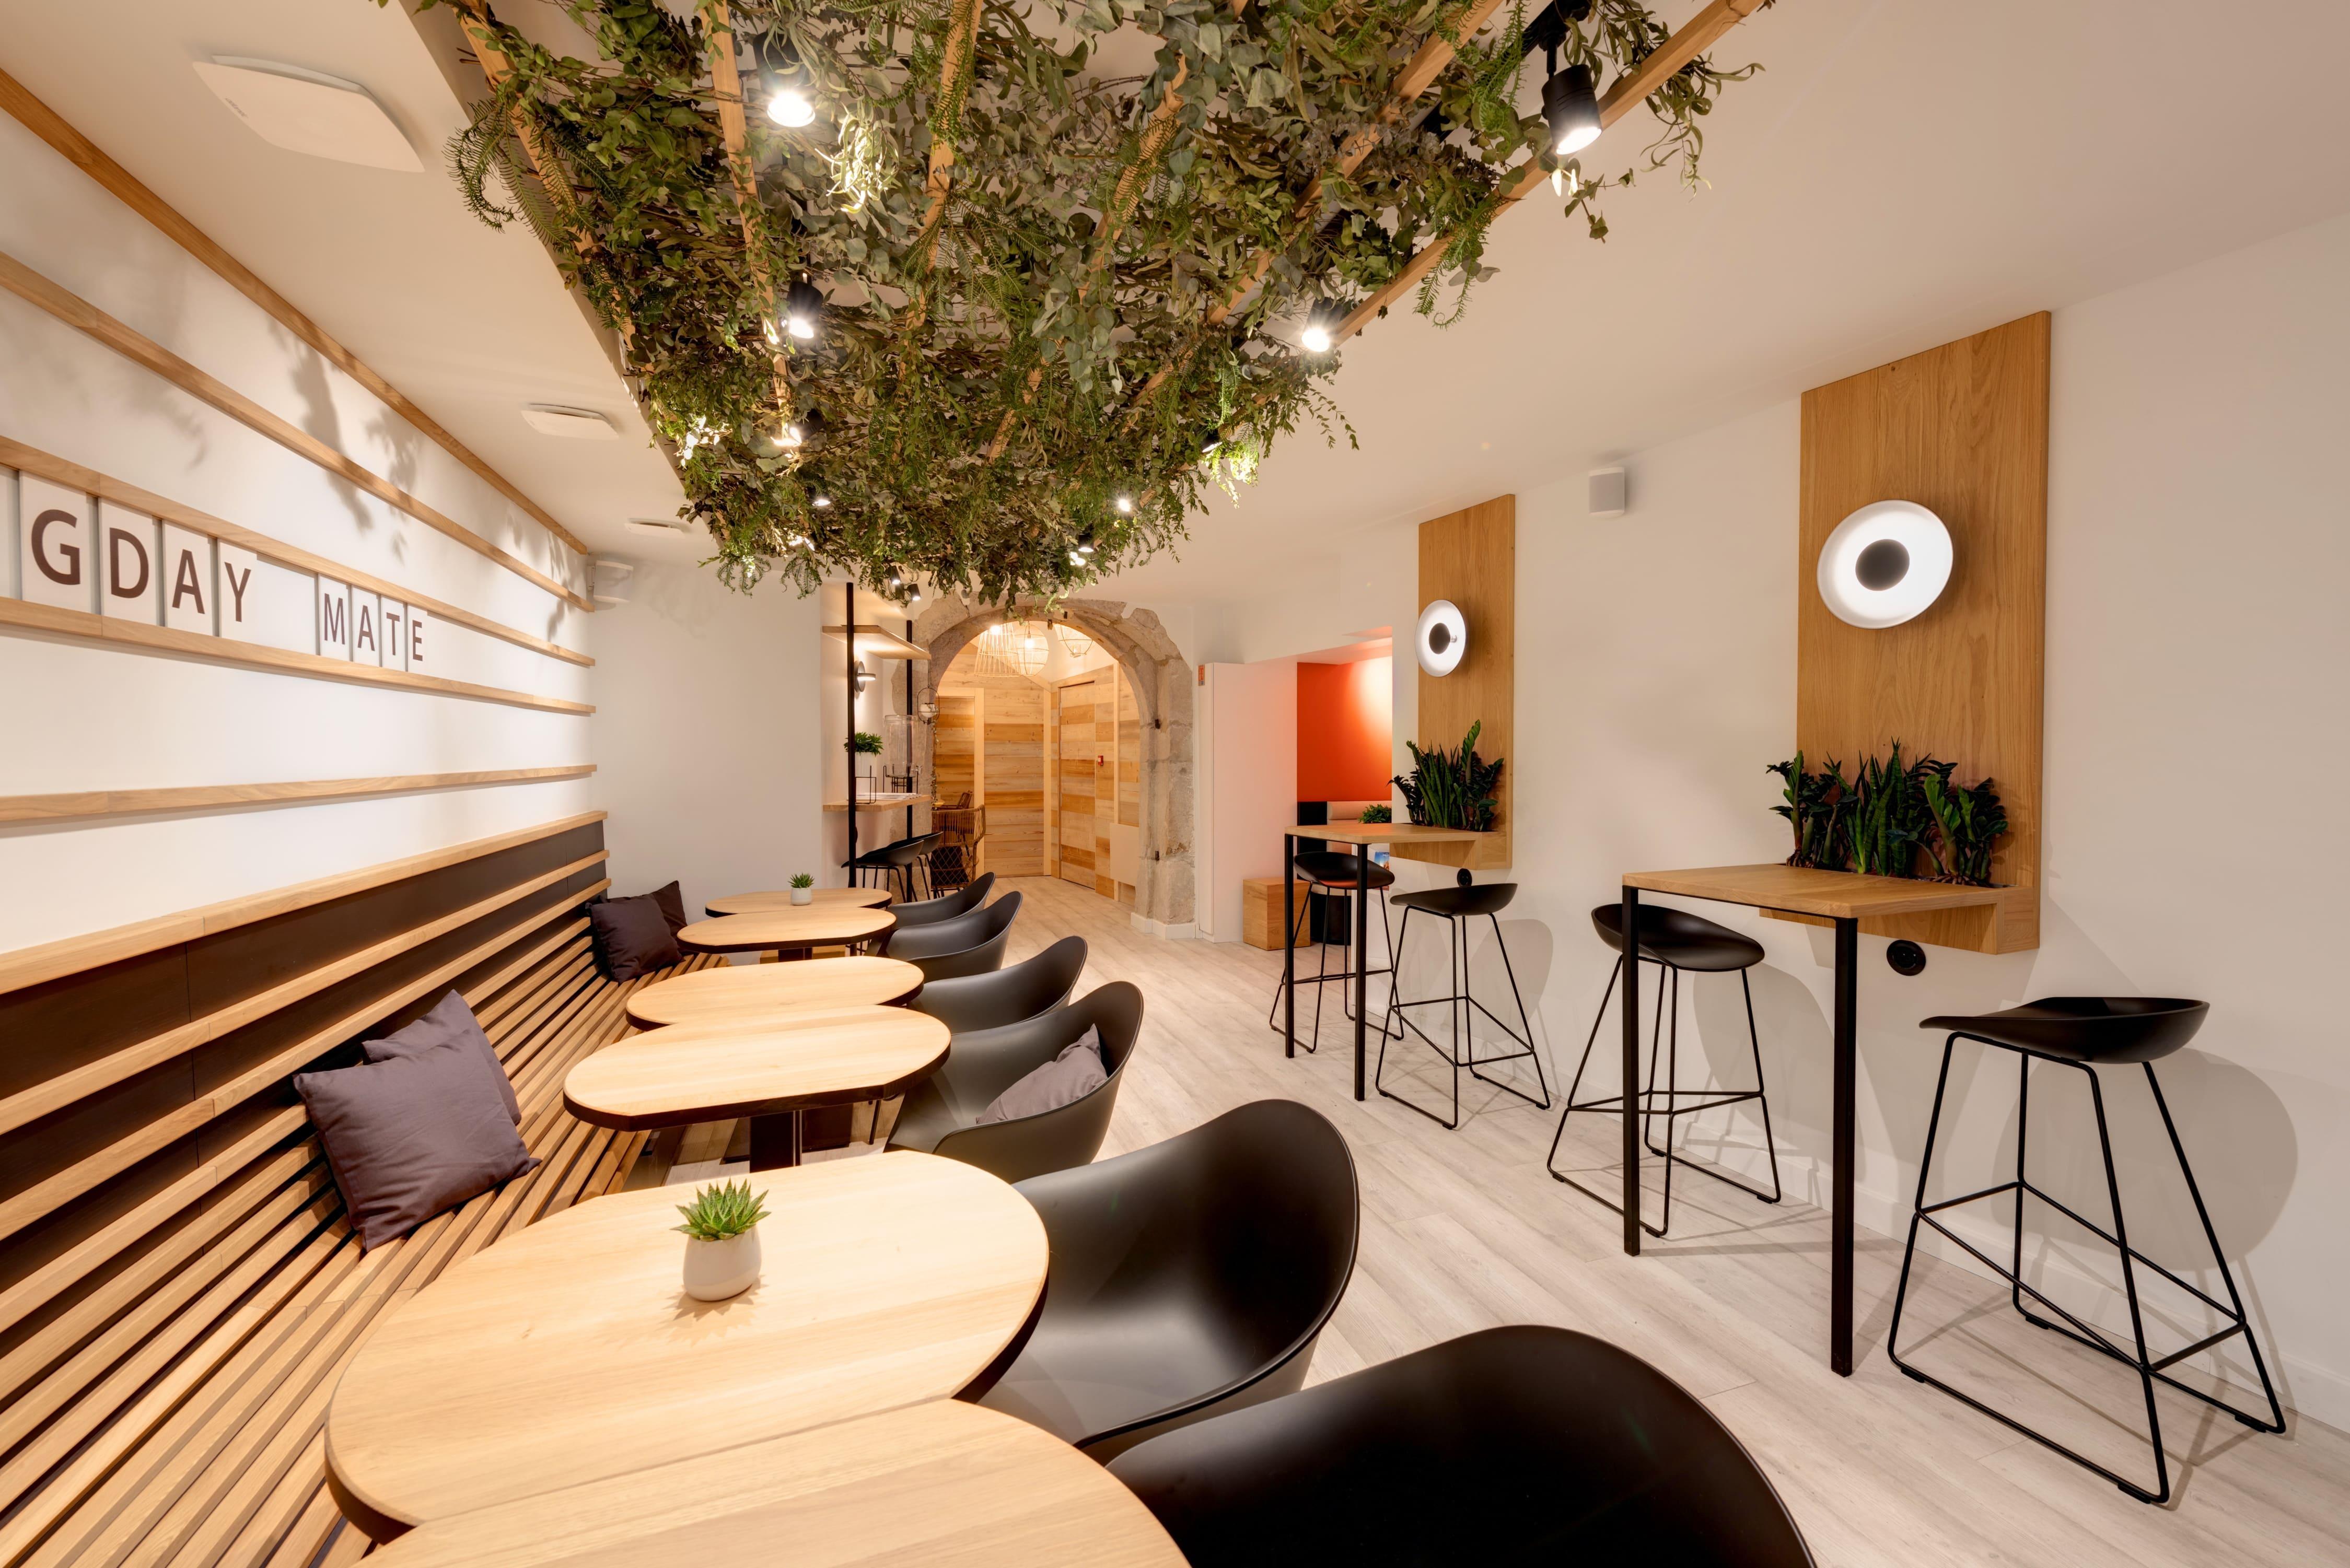 Agencement interieur design métallique ROBI restaurant Haven Annecy 74 agencement en metal 2